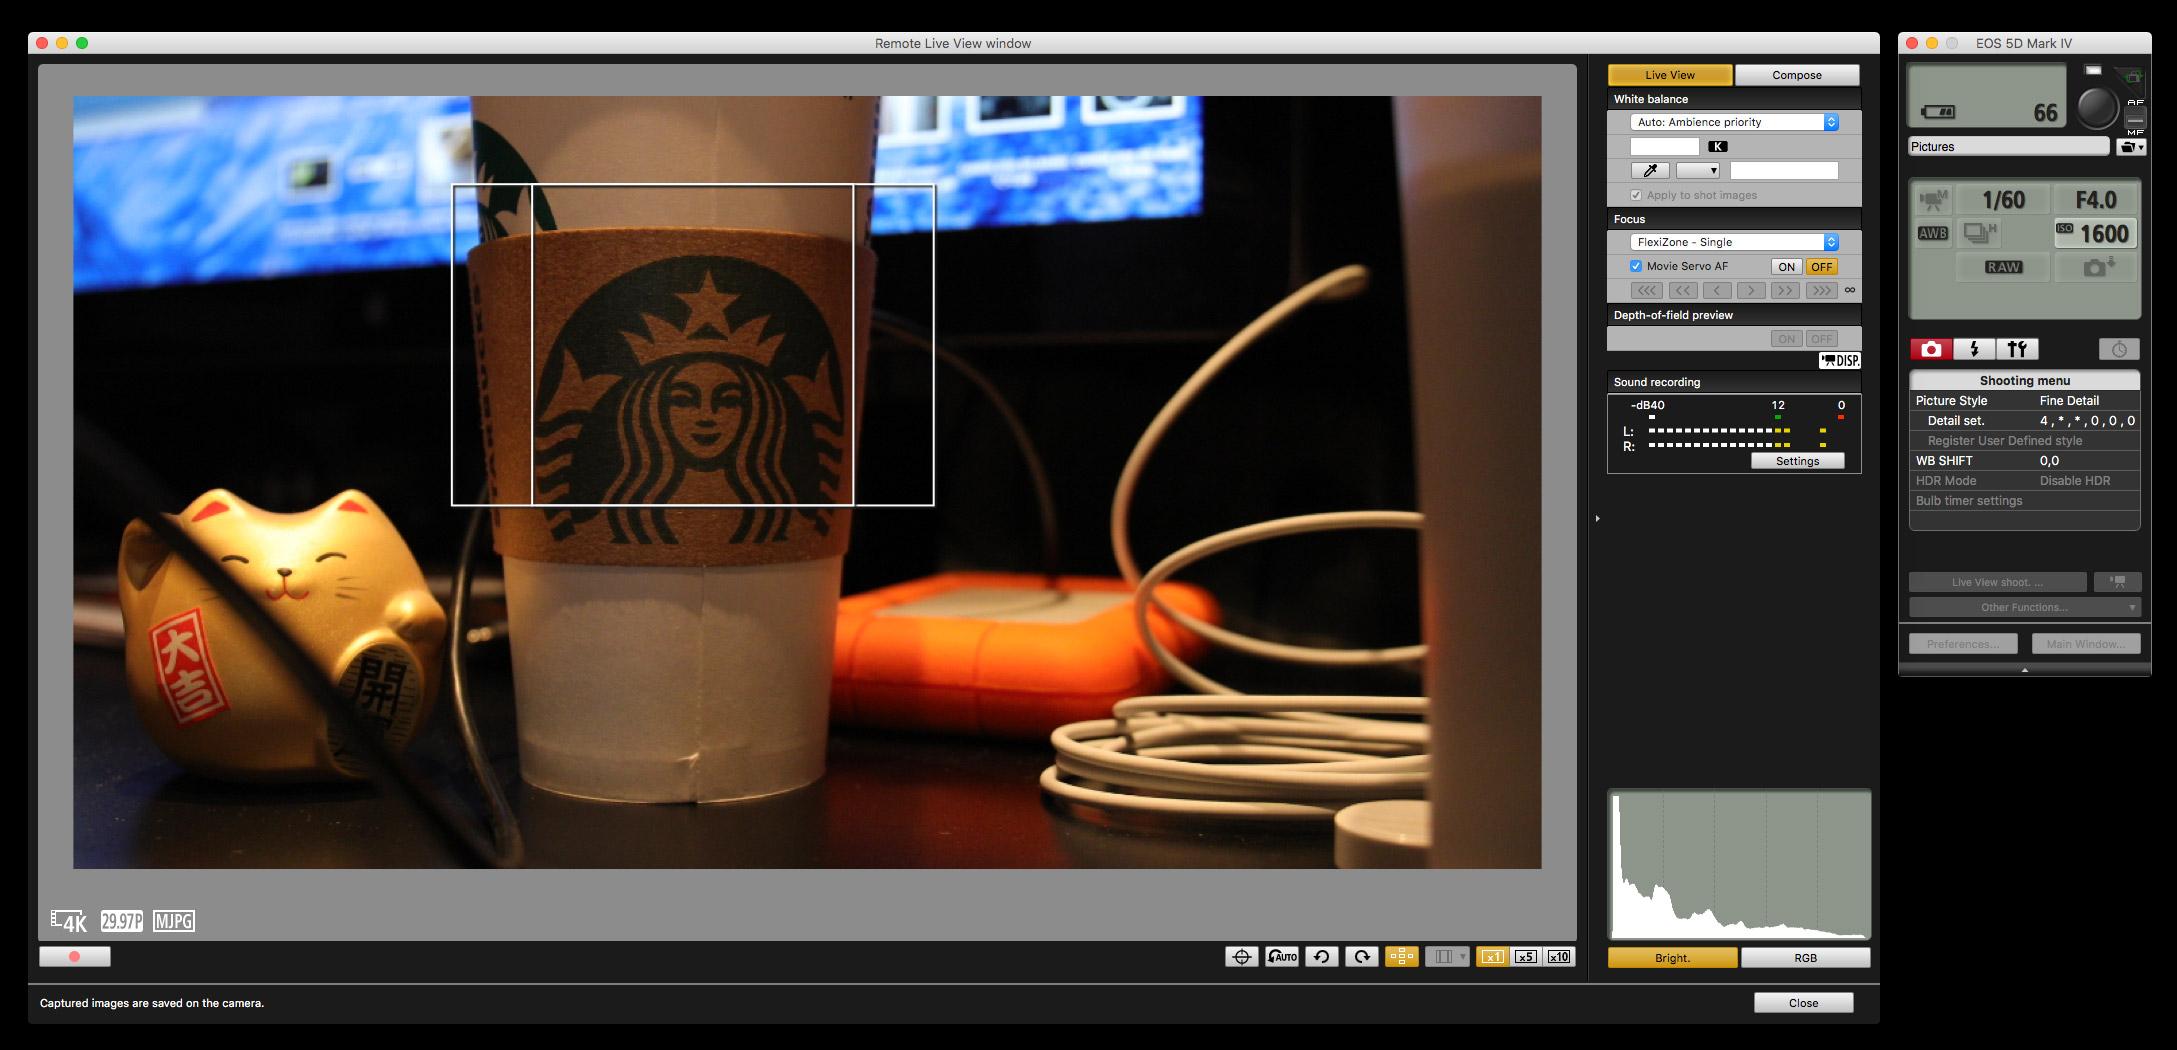 Canon EOS 5D Mark IV UTILITY 3.0